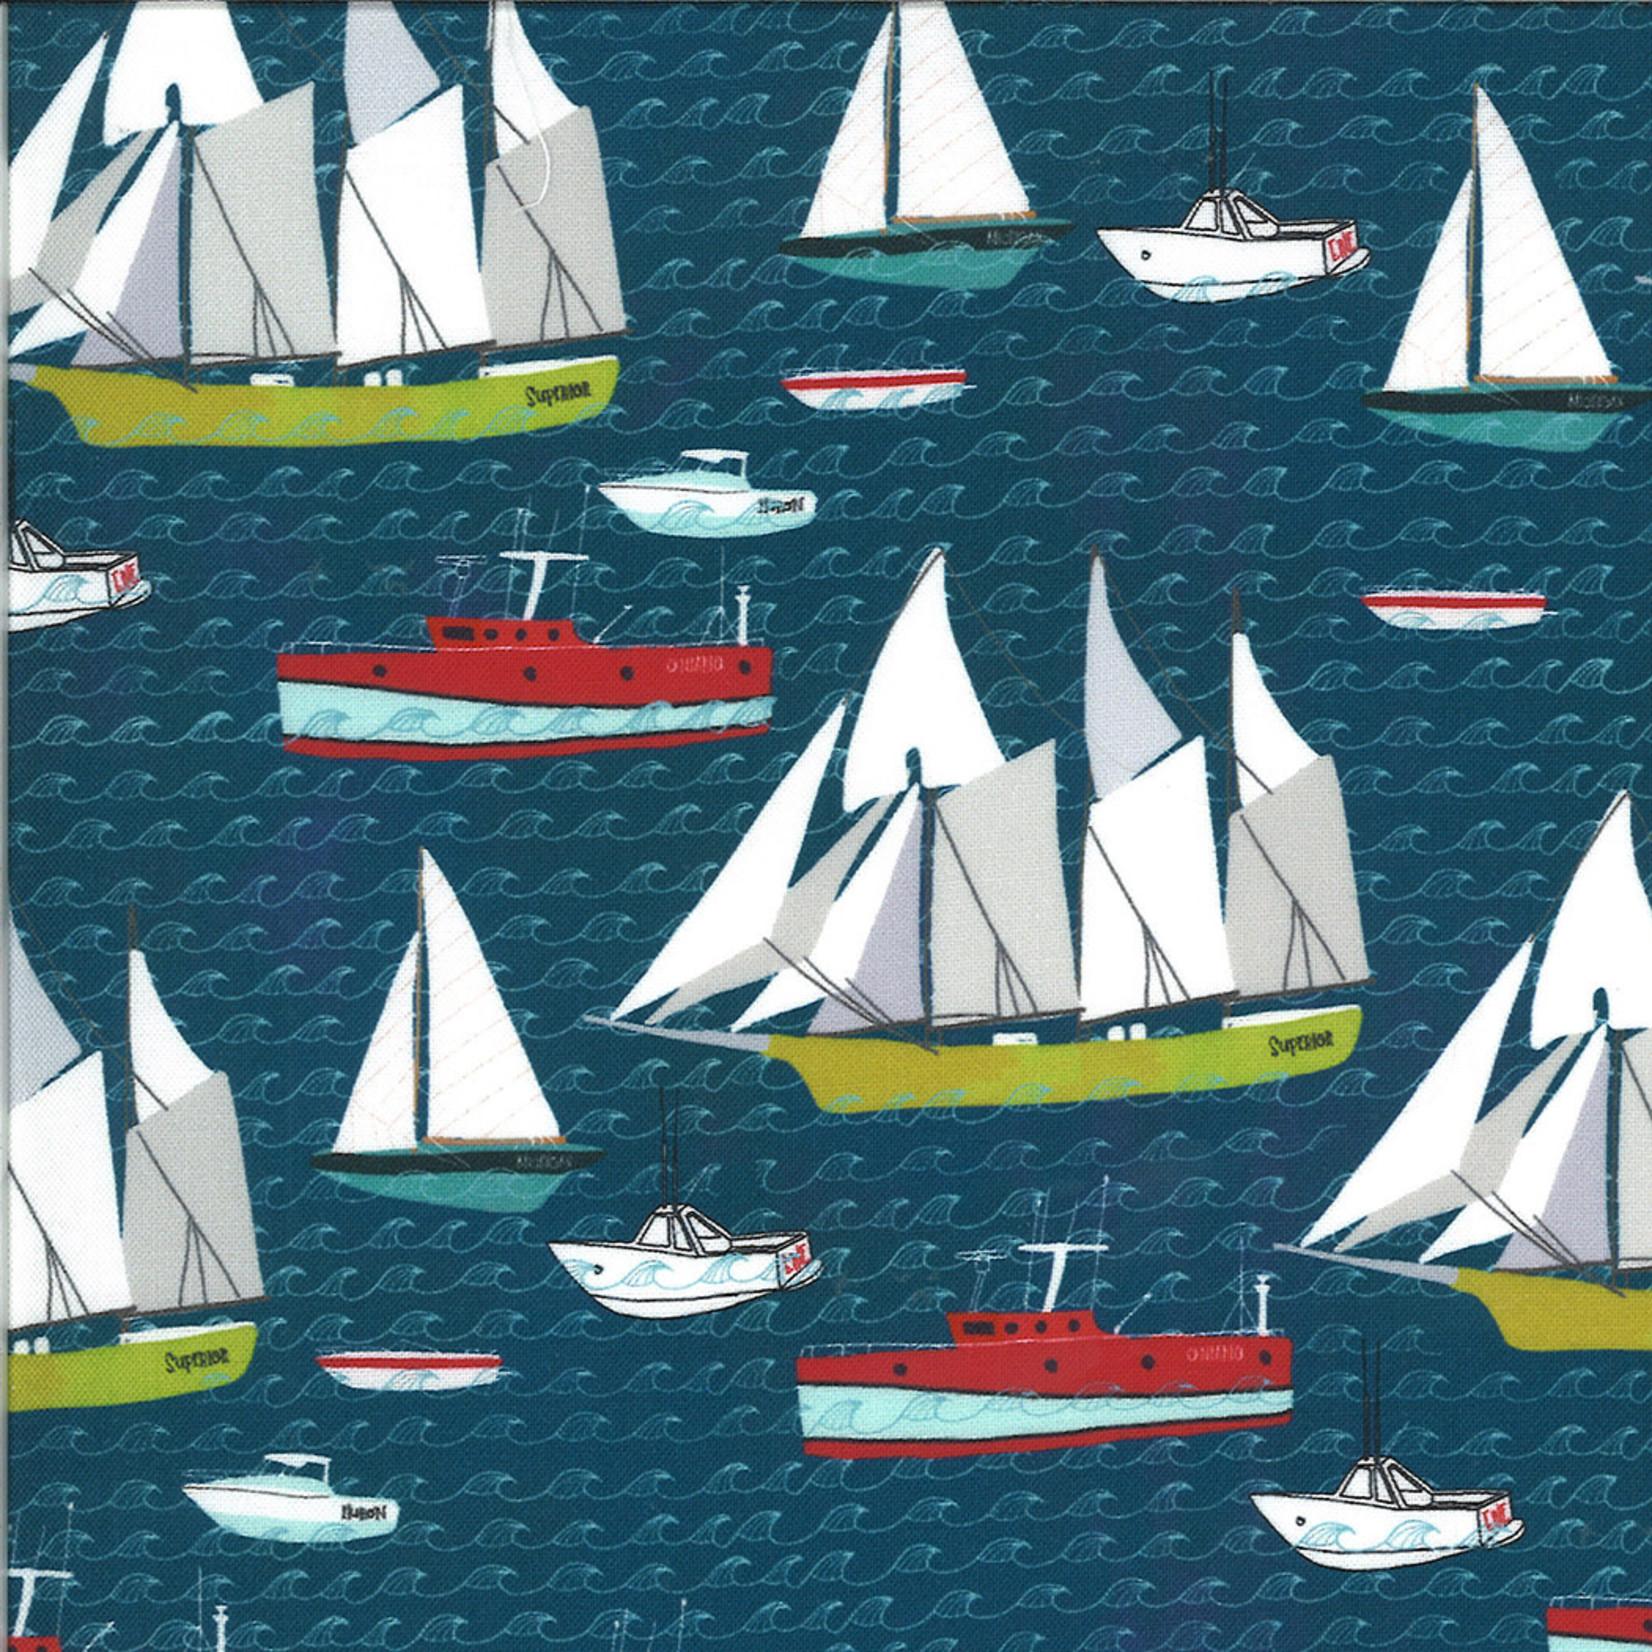 Moda Lakeside Story, Boats, Sailcloth Navy (513352-12) $0.20 per cm or $20/m